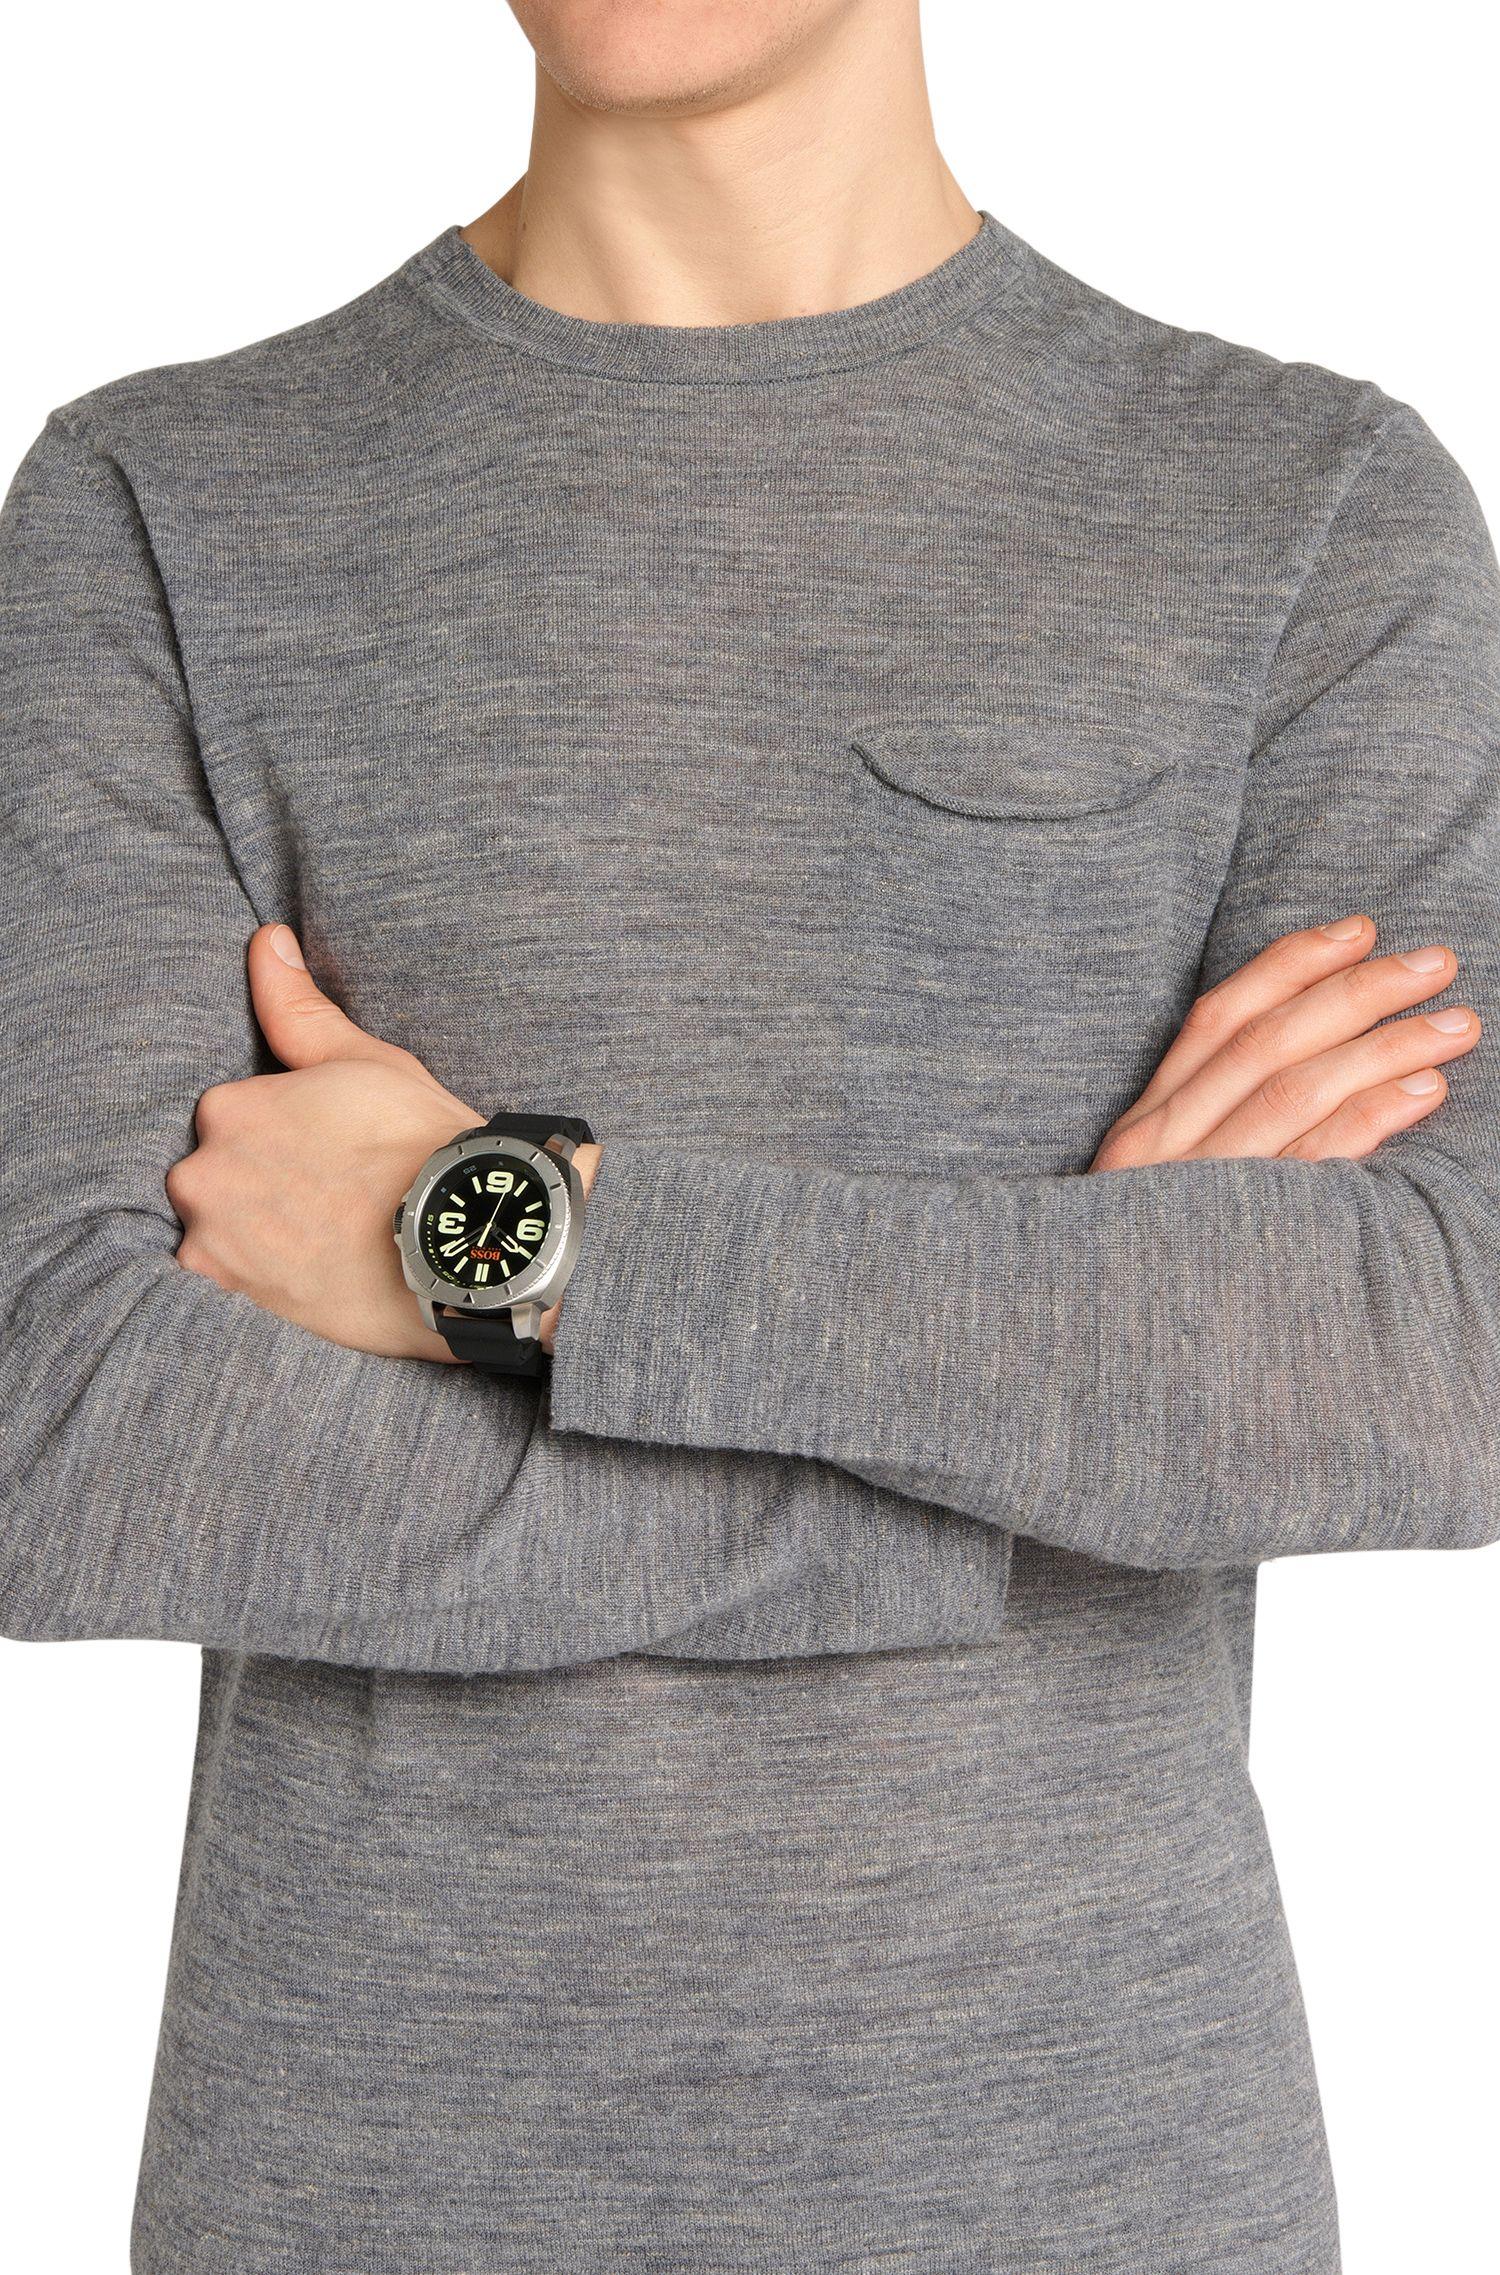 Montre-bracelet «HO7019» avec boîtier en acier inox